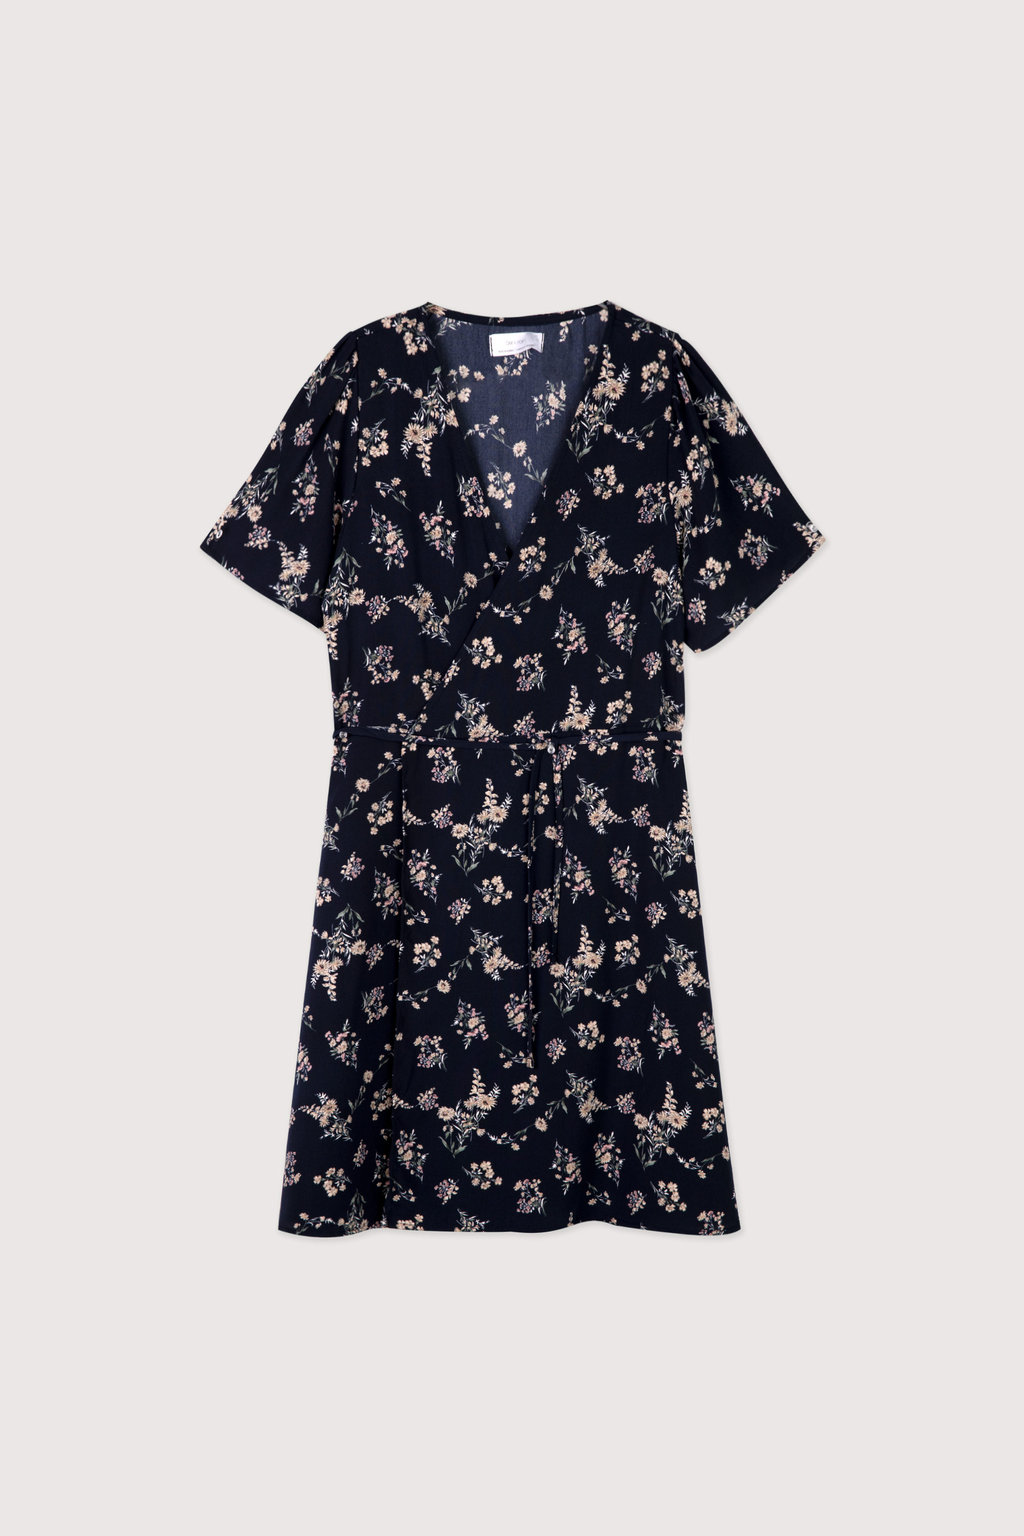 Dress K006 Black 7